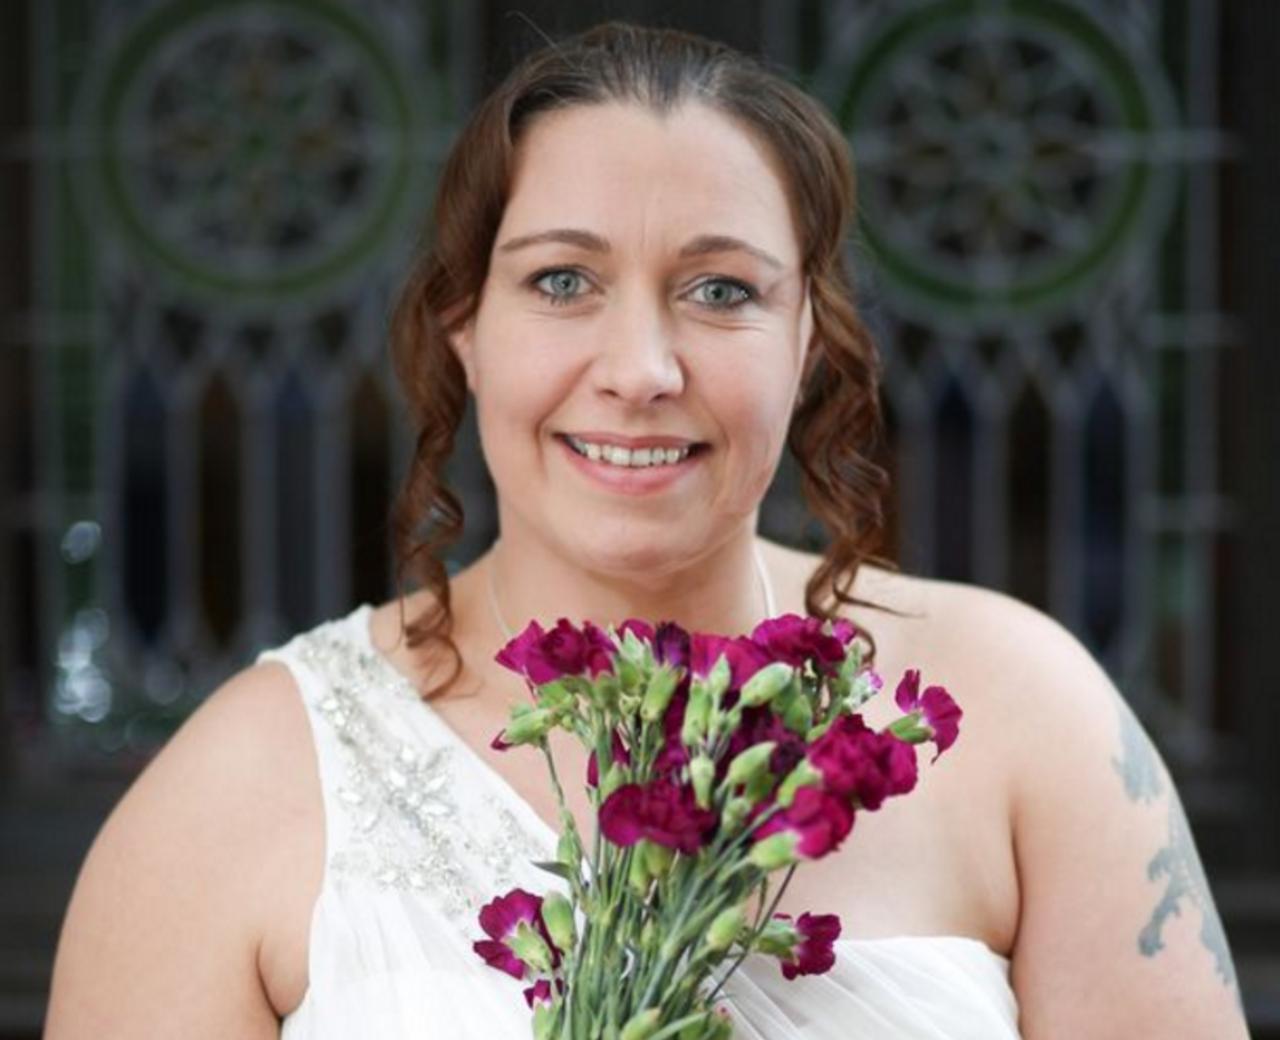 Недождалась принца: британка выходит замуж засаму себя